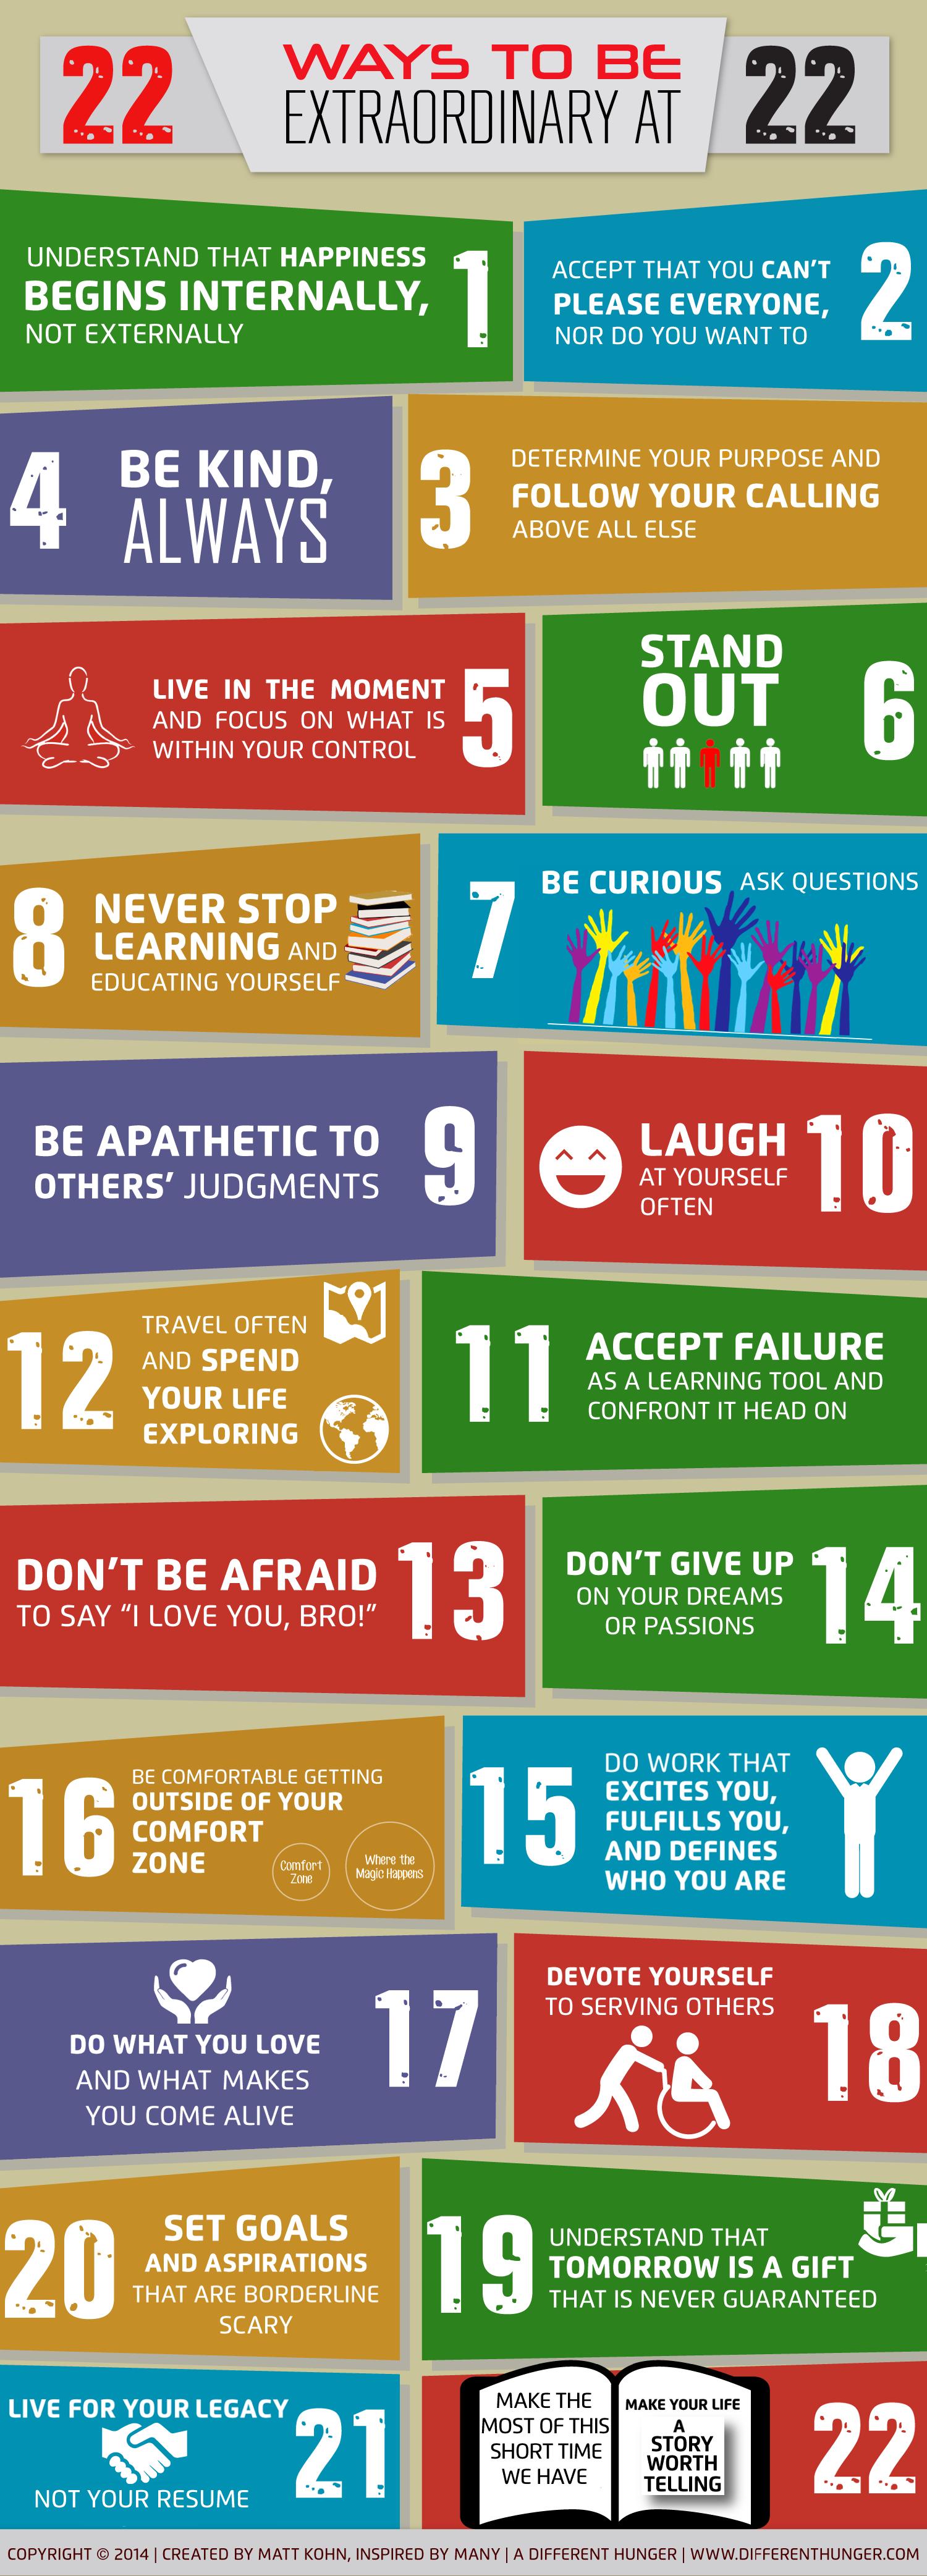 22 Ways to be Extraordinary at 22